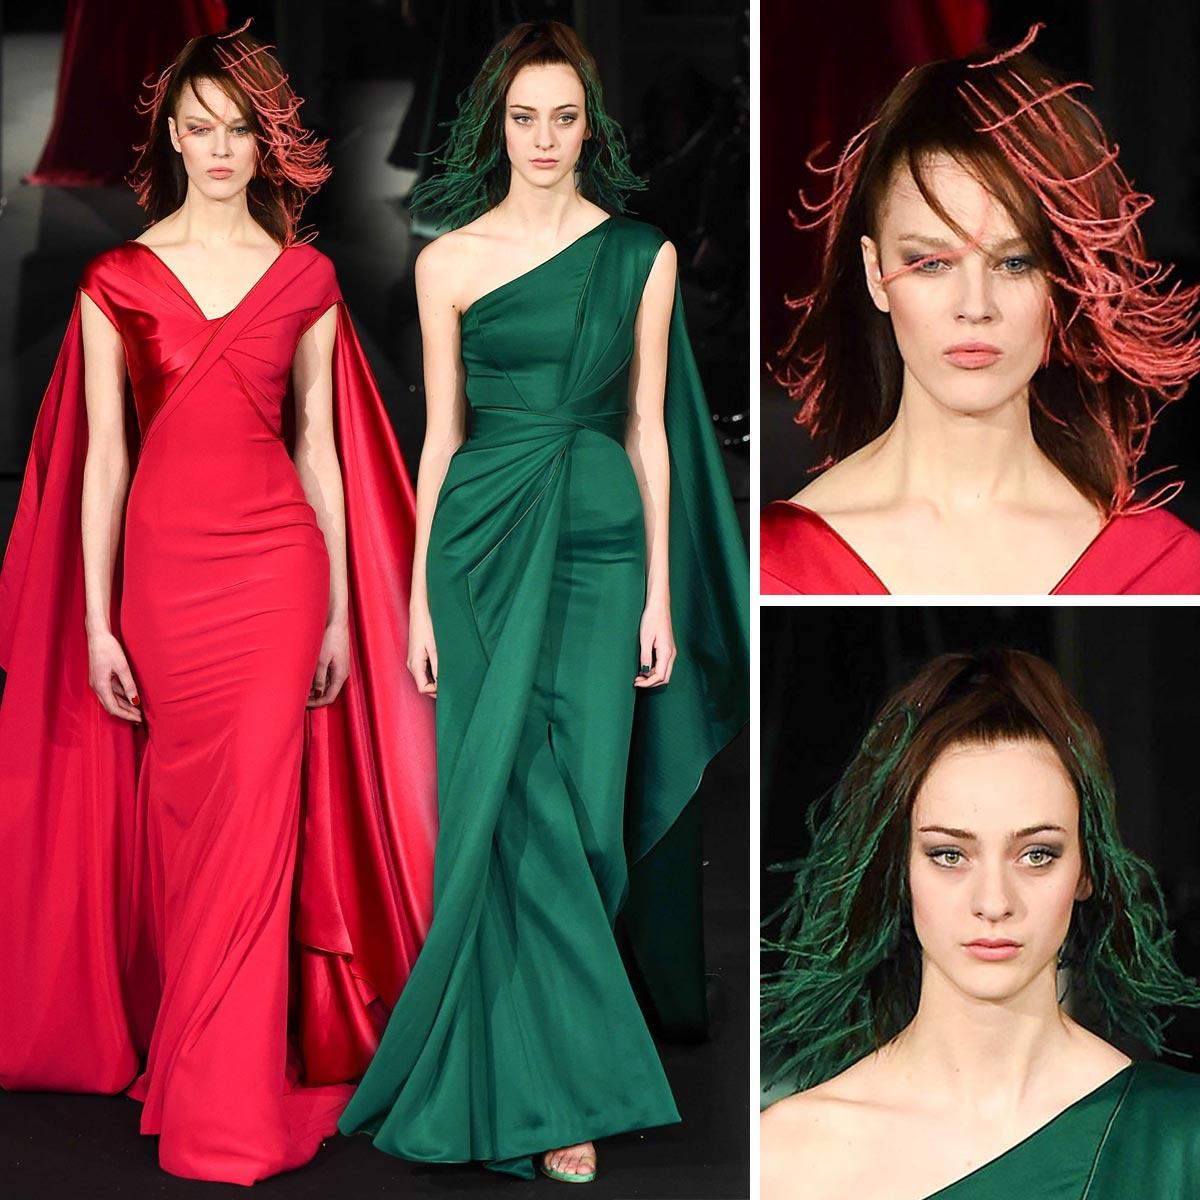 Večerné šaty z Haute Couture Jar 2015 Alexis Mabille perfektne ladia s účesmi zdobenými perím.